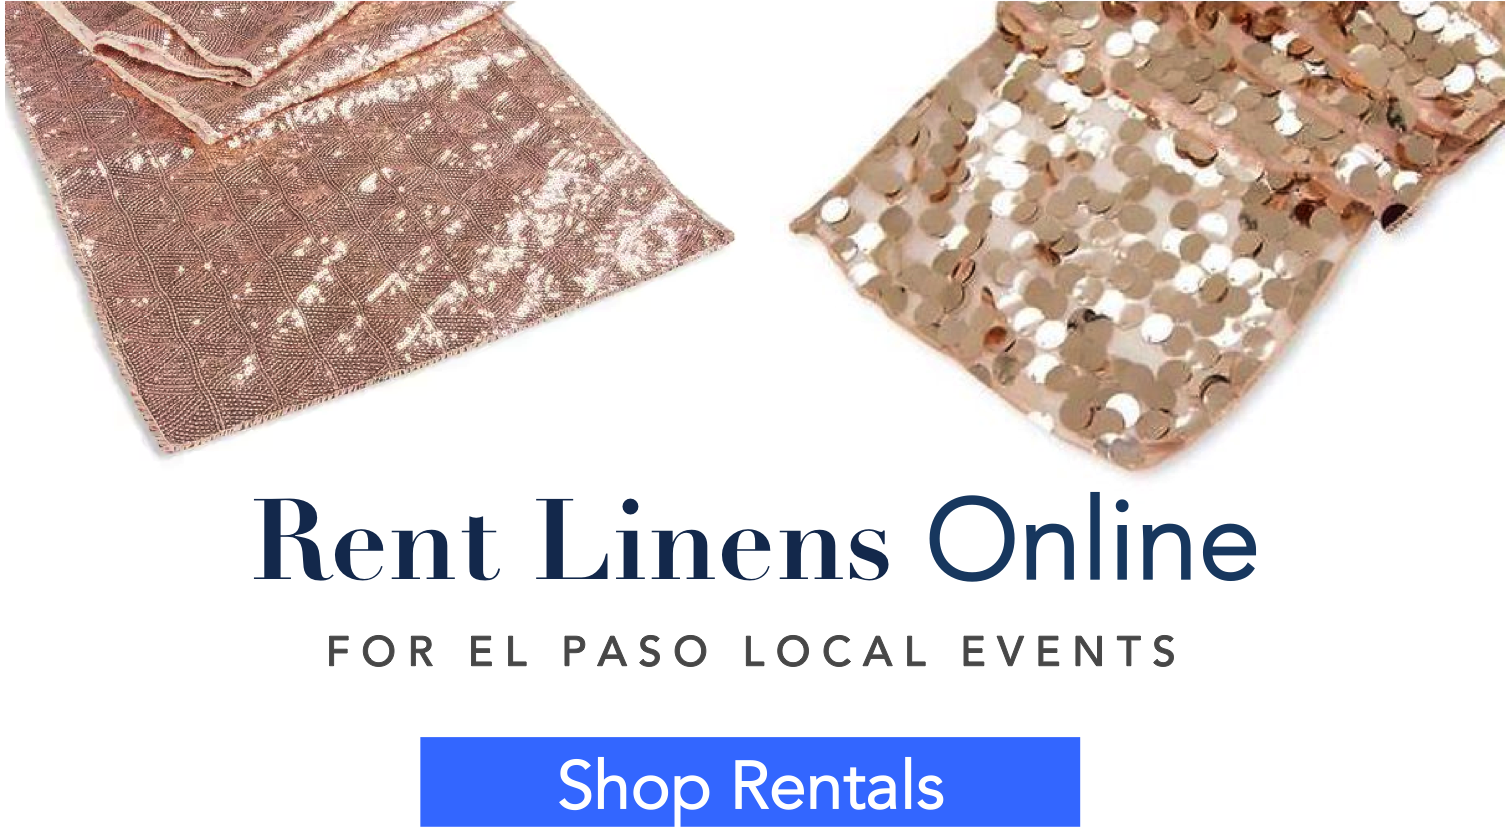 el-paso-manteles-79912-morado-de-renta-rental-linens-table-occasions-tons-of-linens-angies-floral-designs-el-paso-florist.png